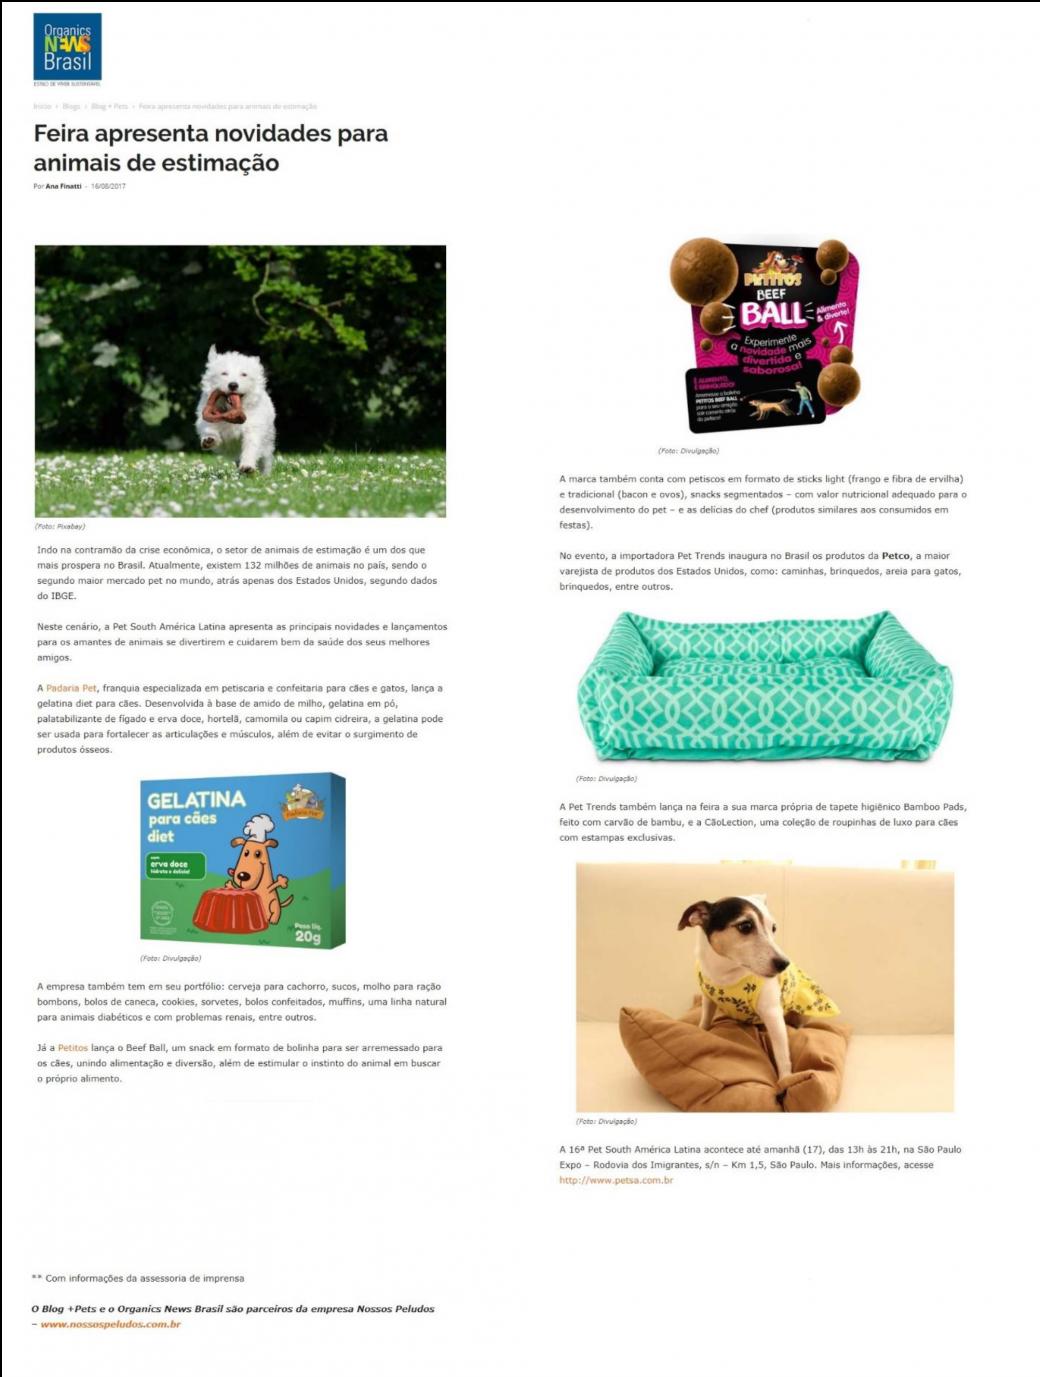 Organic News destaca produtos Pet Trends